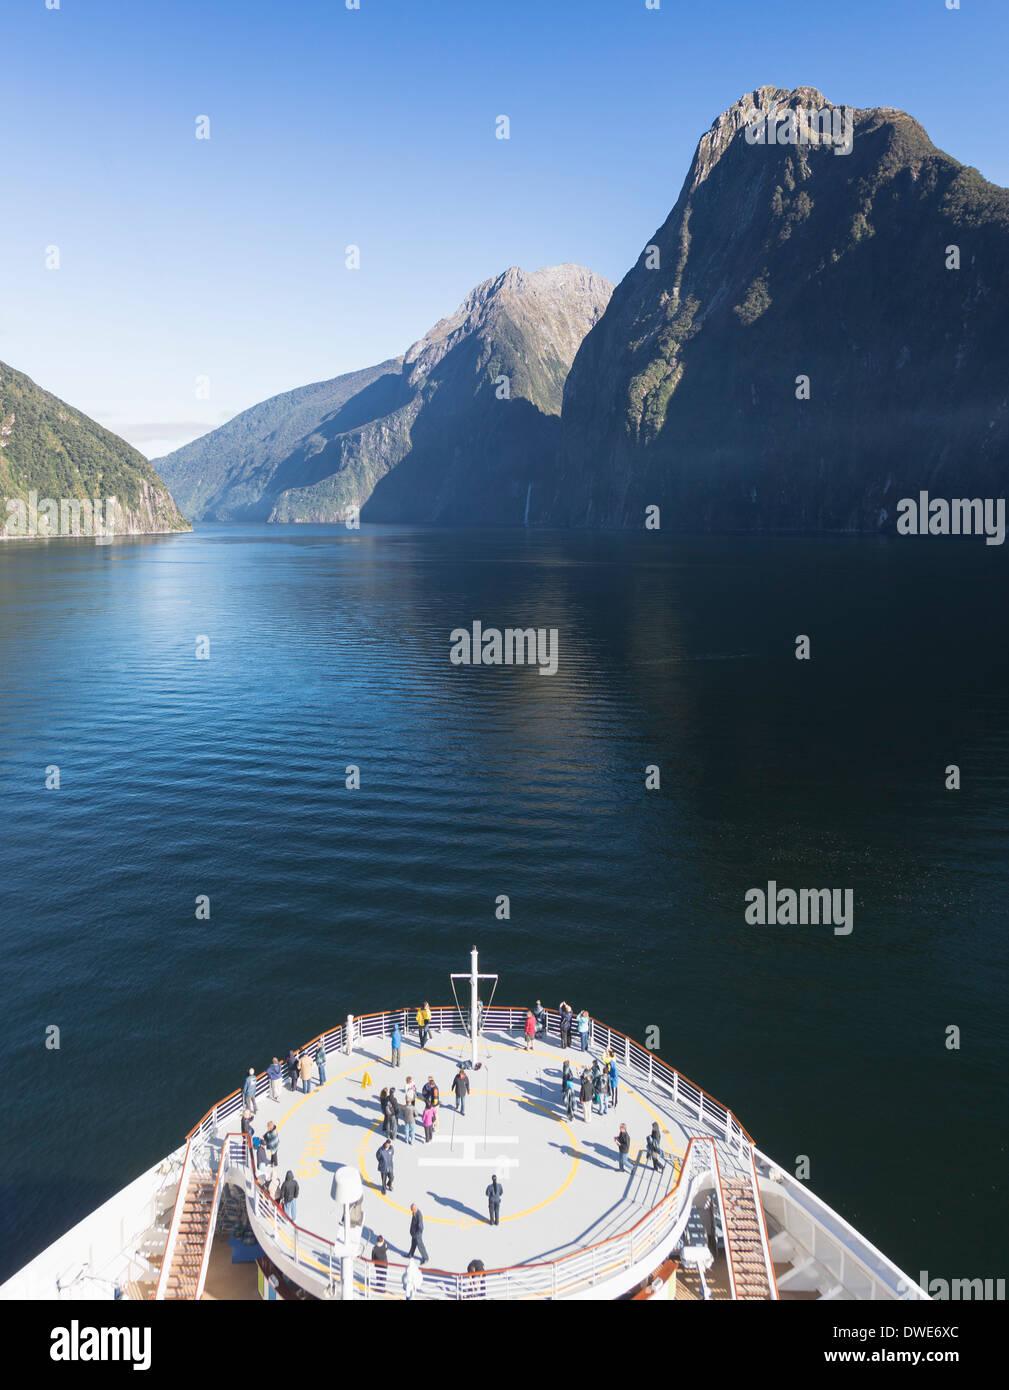 New Zealand, Milford Sound, Fiordland National Park - Cruse ship sails into Milford Sound, South Island, New Zealand - Stock Image